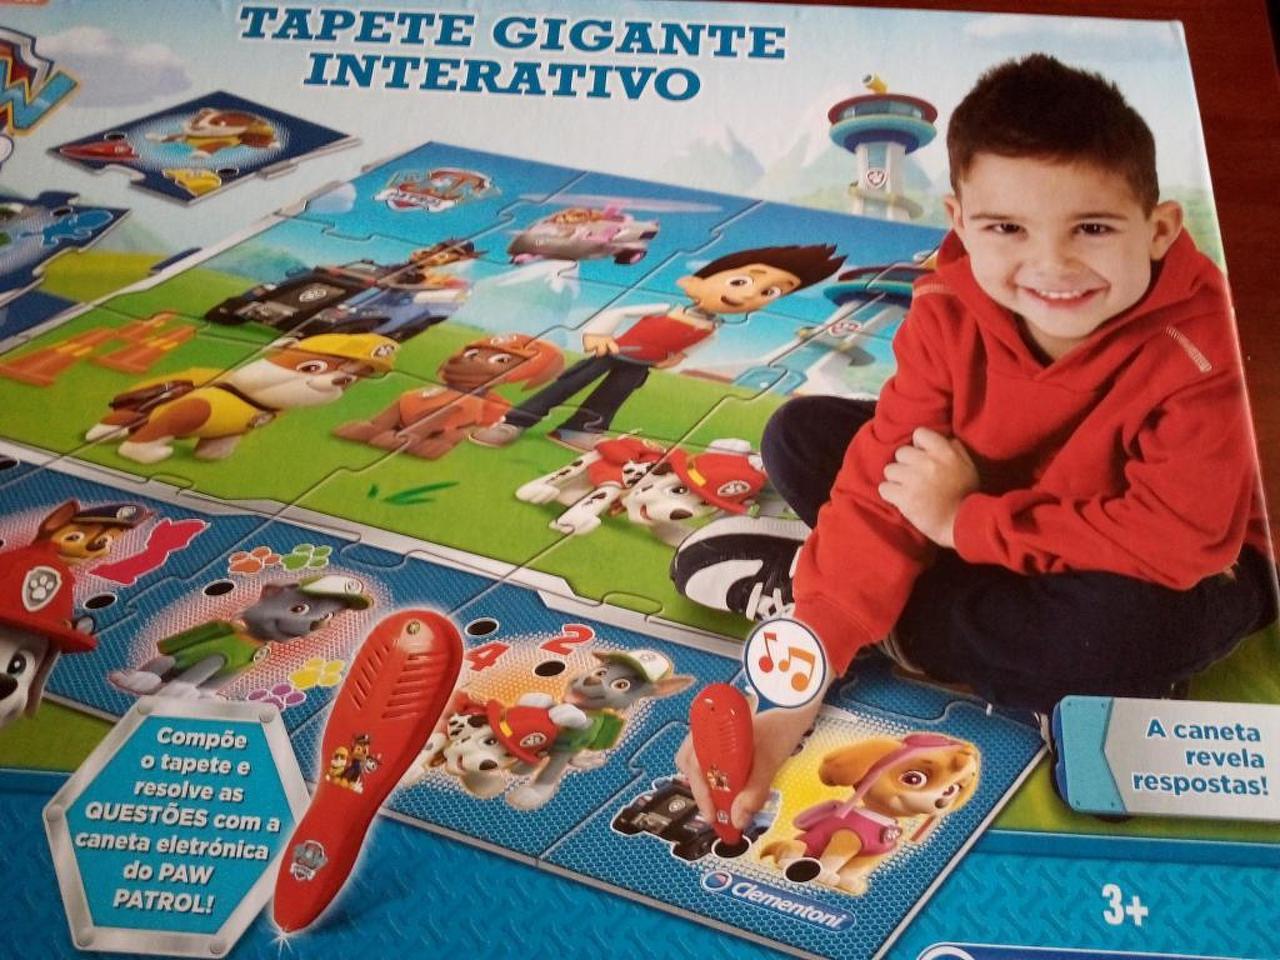 Tapete Gigante Iterativo Paw Patrol / Patrulha Pata, 3+Anos. Novo - 2/4